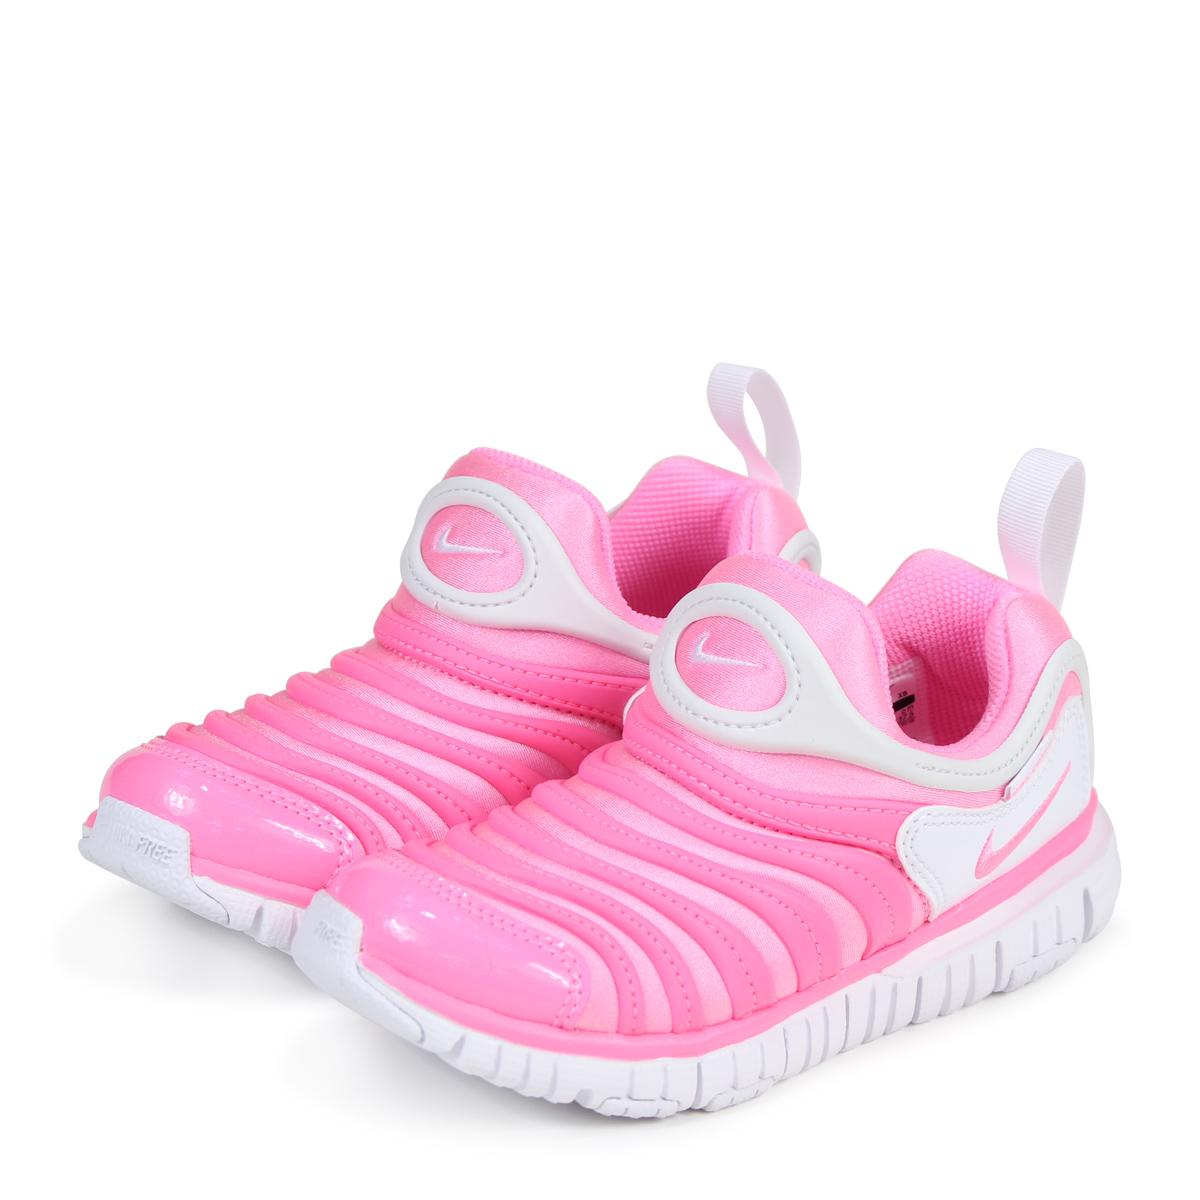 size 40 41c28 5f37c ... shop nike dynamo free ps nike dynamo free kids sneakers 343738 625 pink  3 23 shinnyu